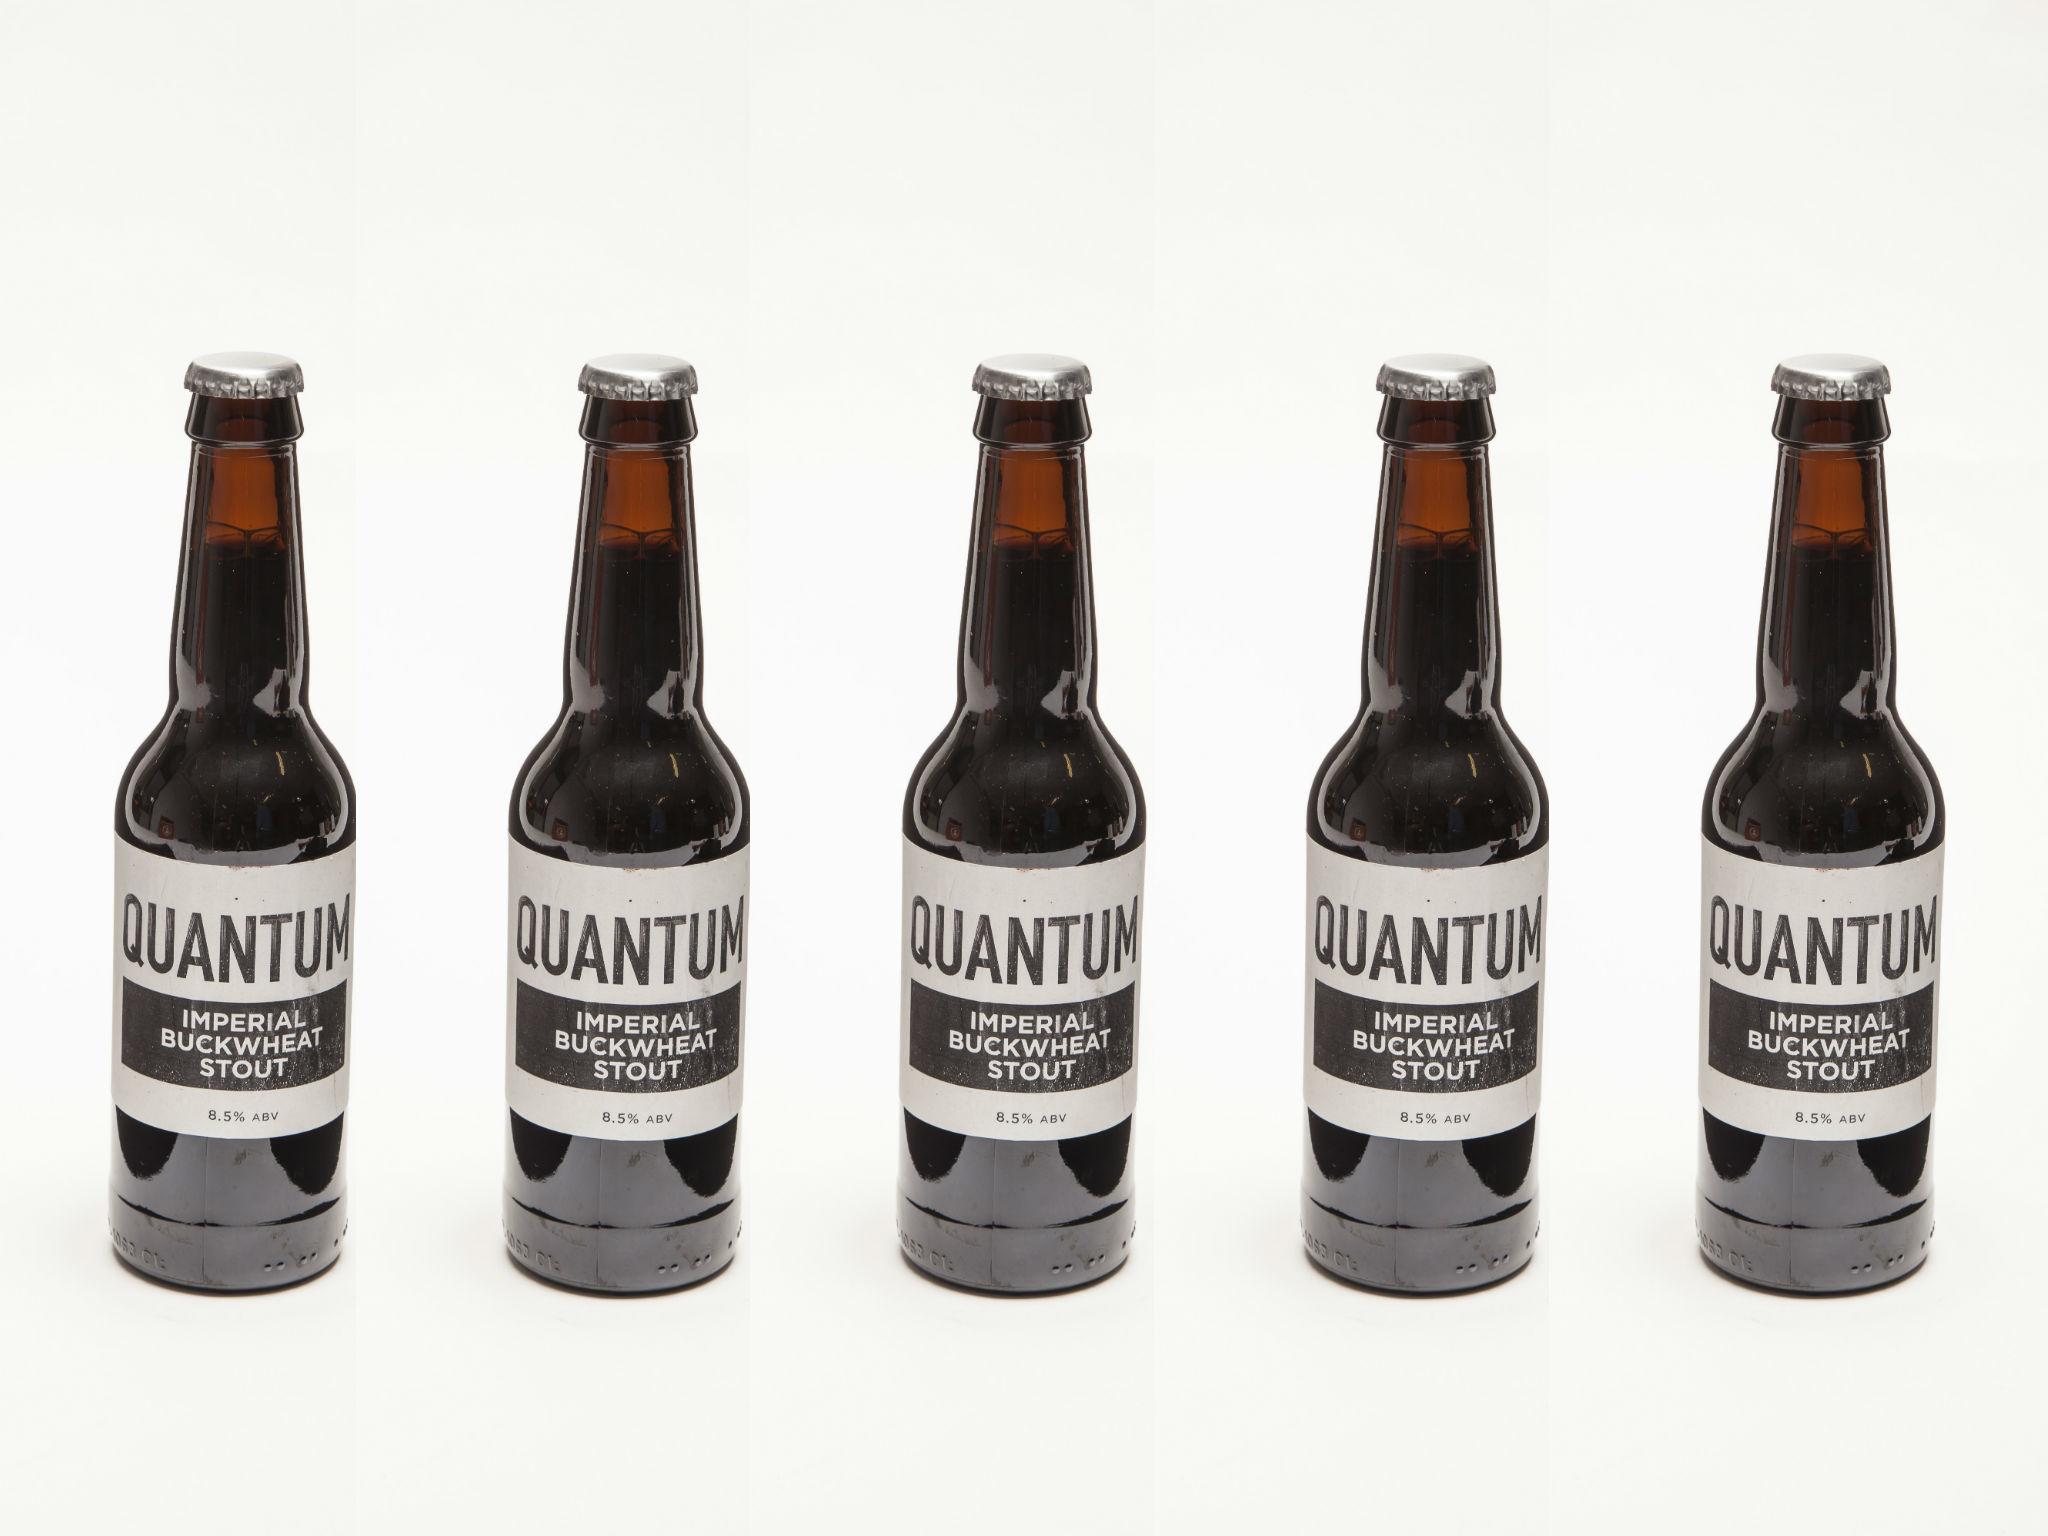 Quantum – Imperial Buckwheat Stout (8.5 percent)